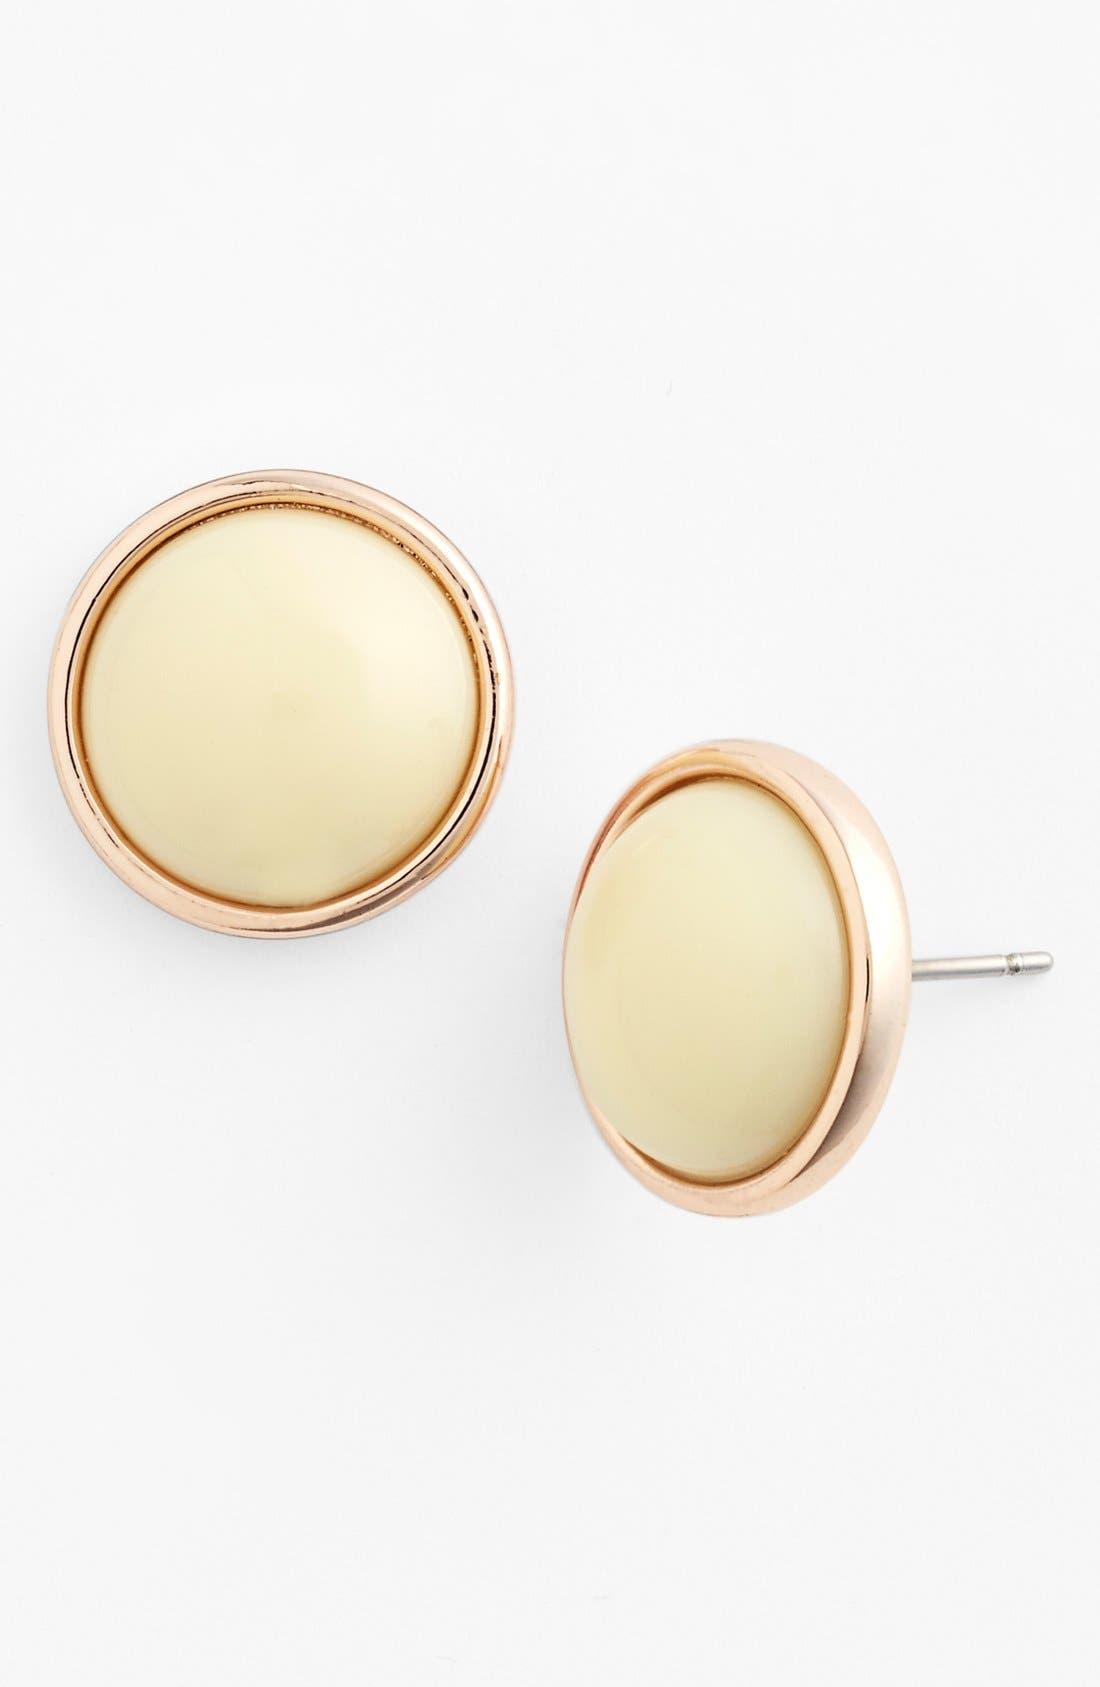 Alternate Image 1 Selected - MARC BY MARC JACOBS 'Geometric' Stud Earrings